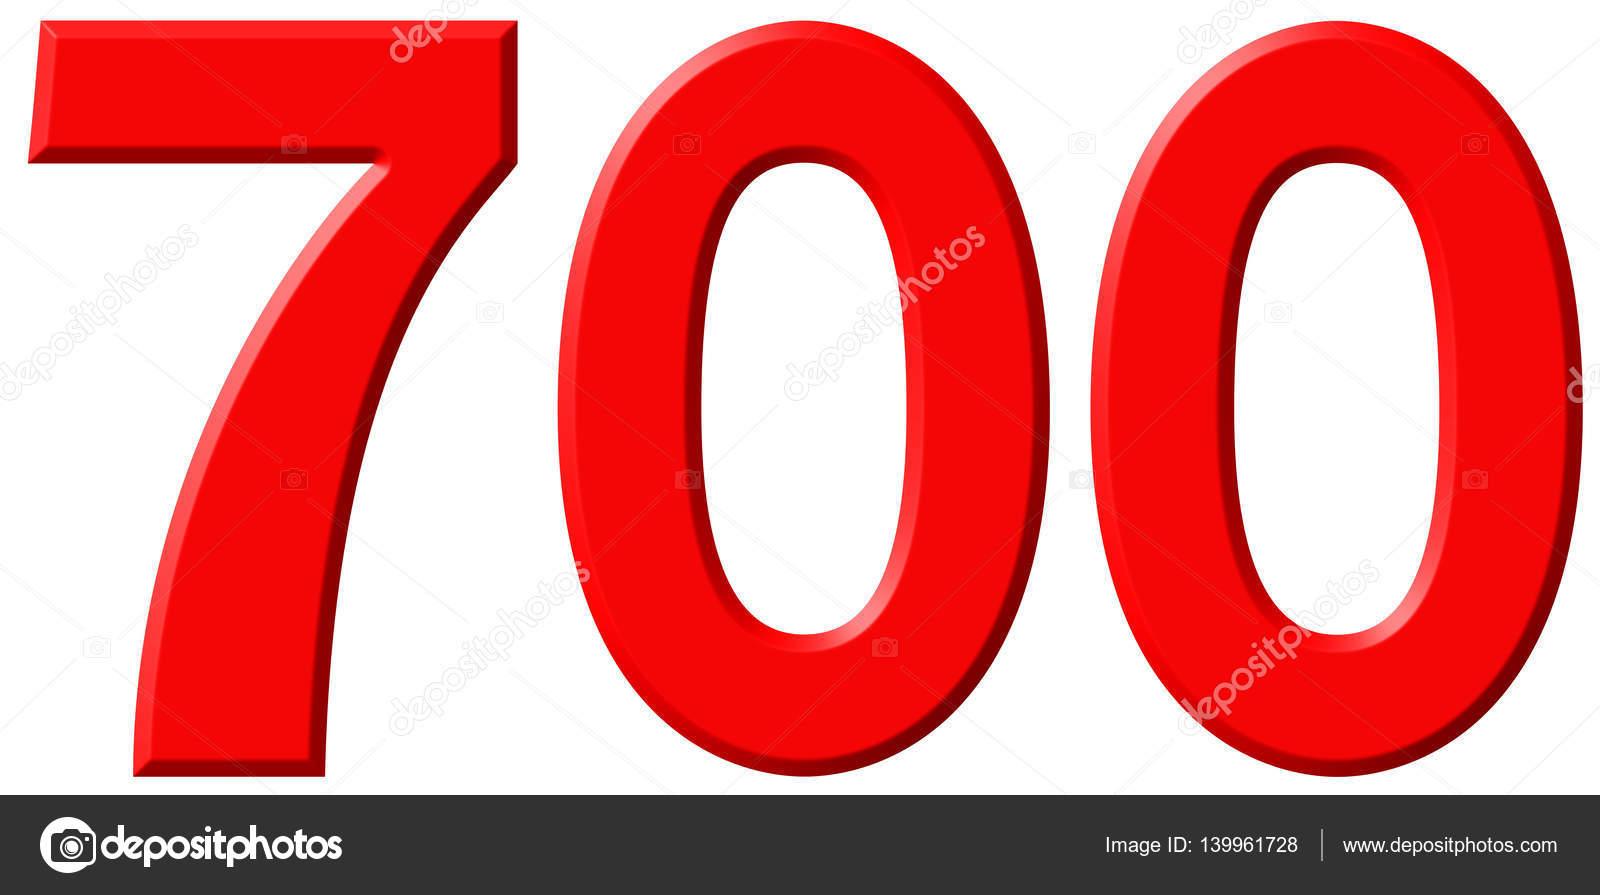 = 700